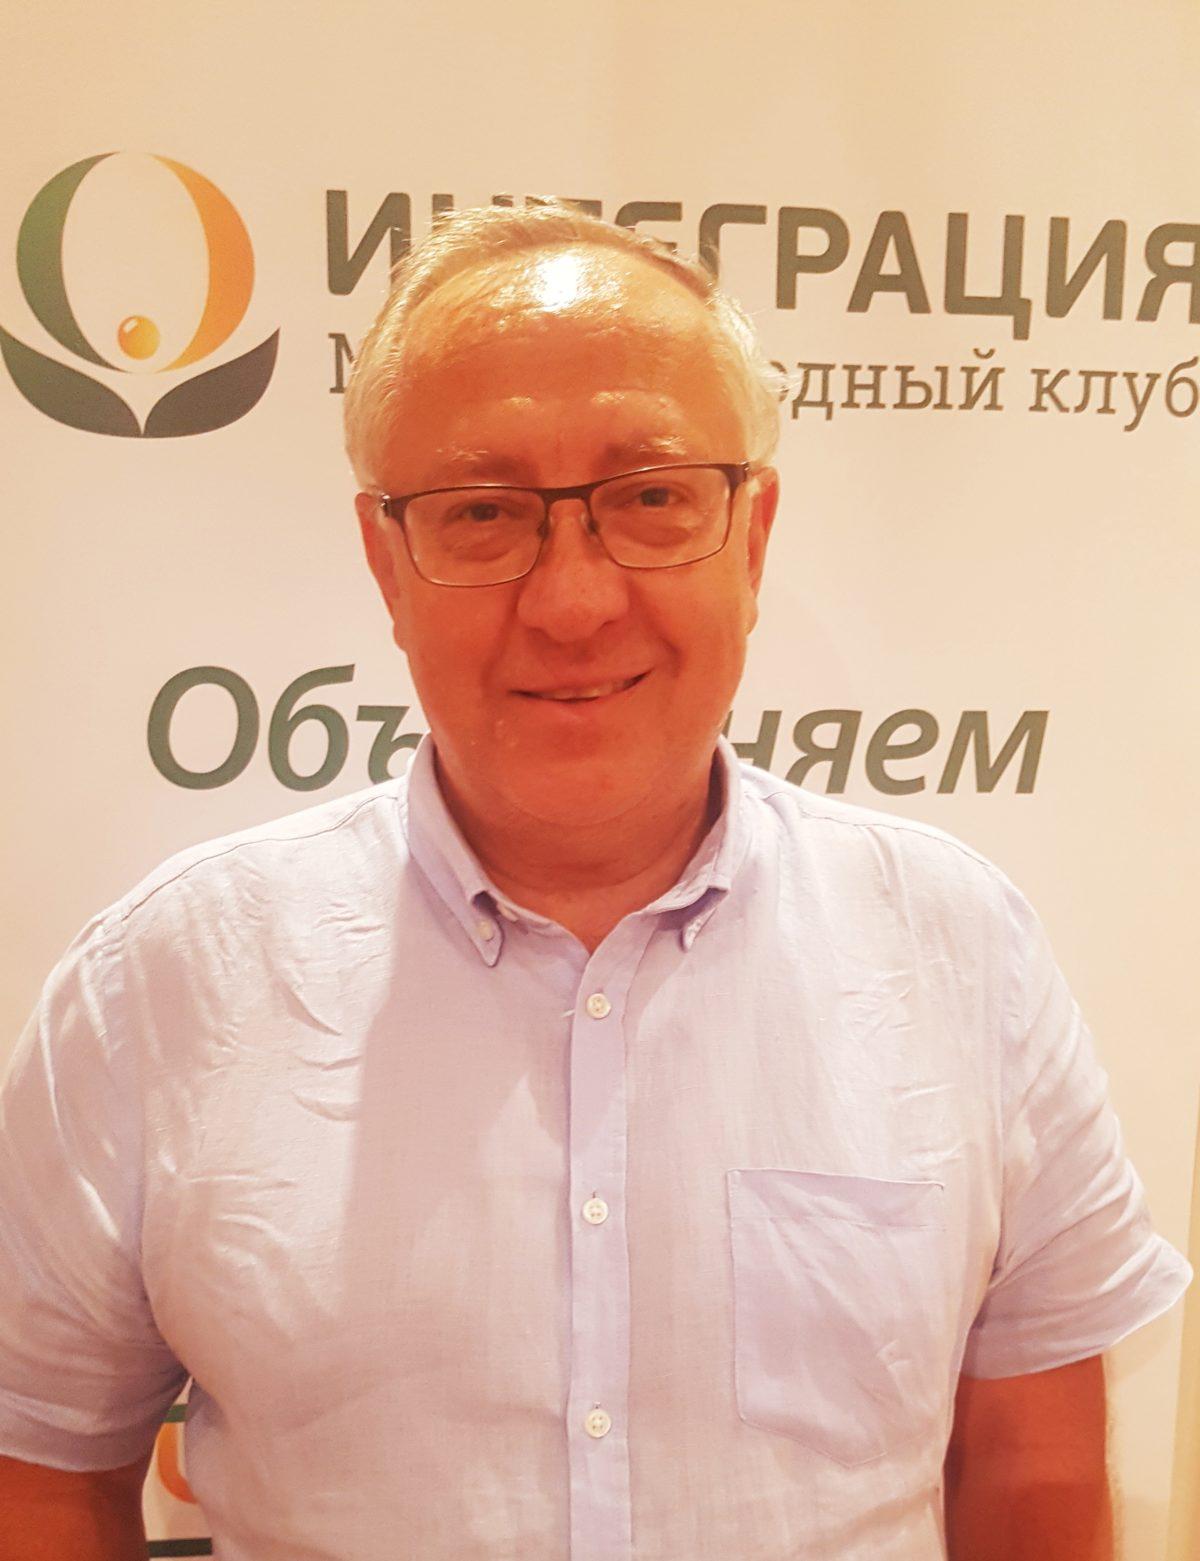 Пахомов Павел